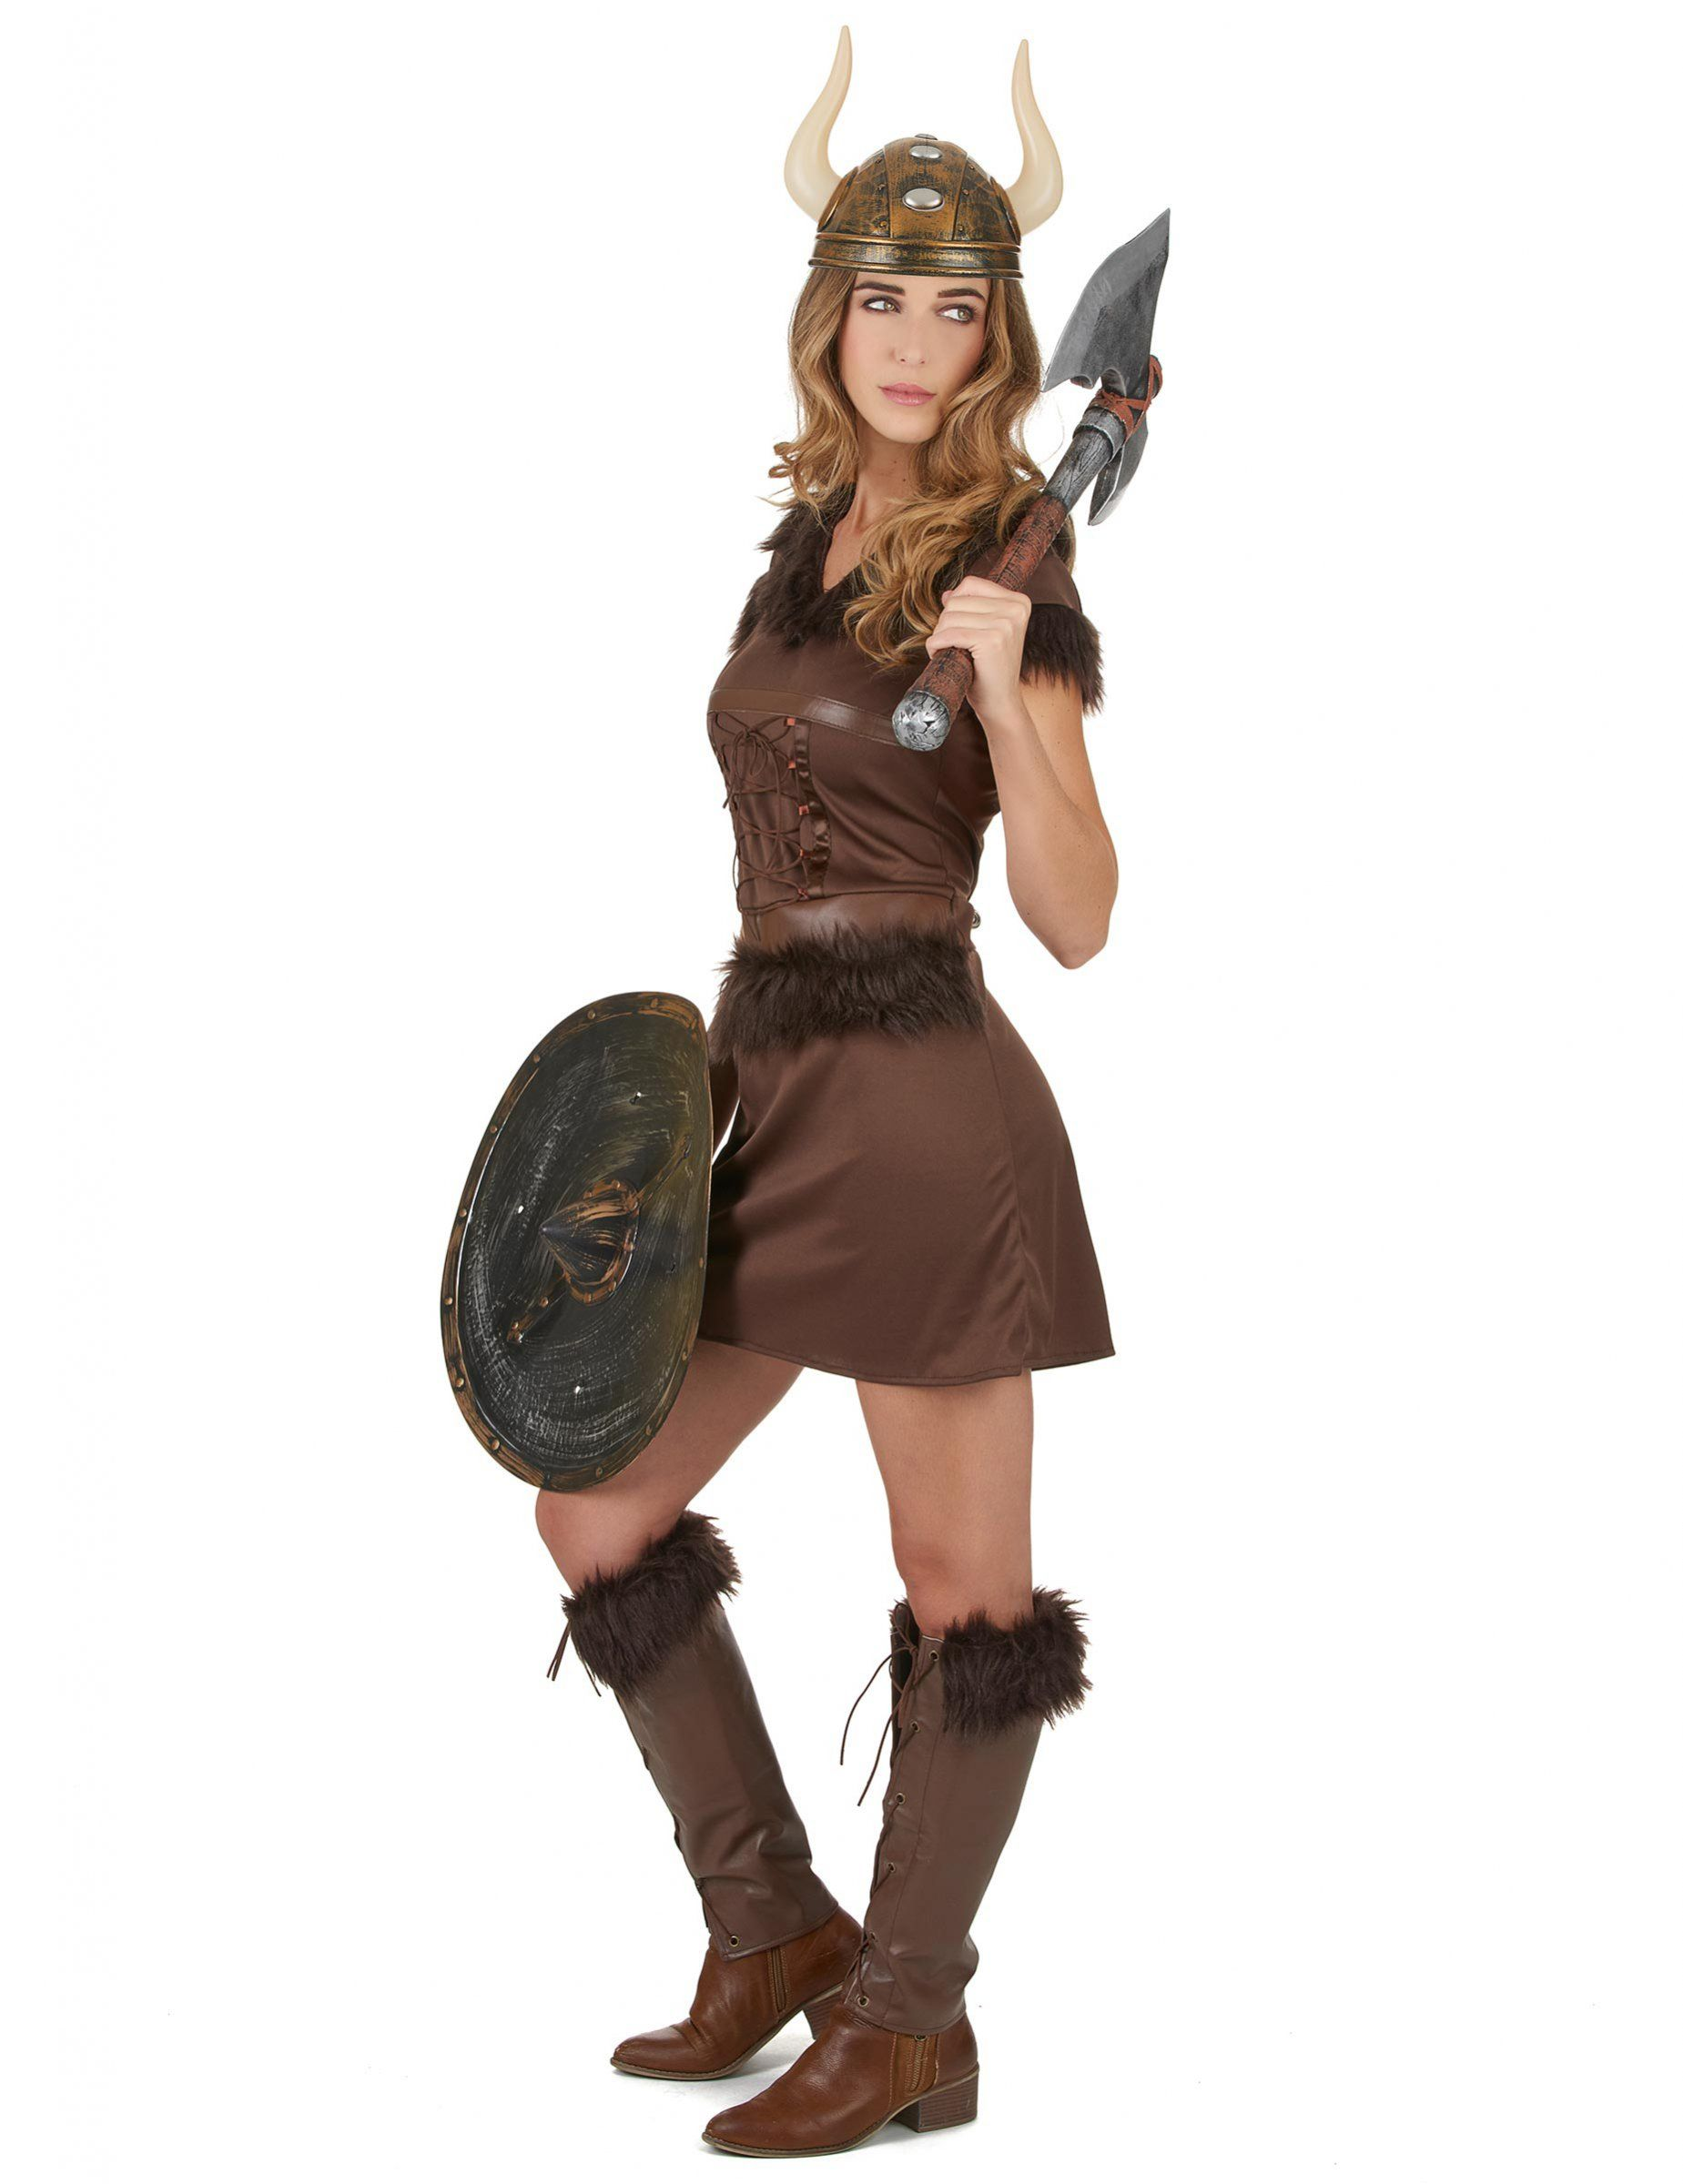 Sexy viking costume for women in 2018 | Viking costume | Pinterest ...